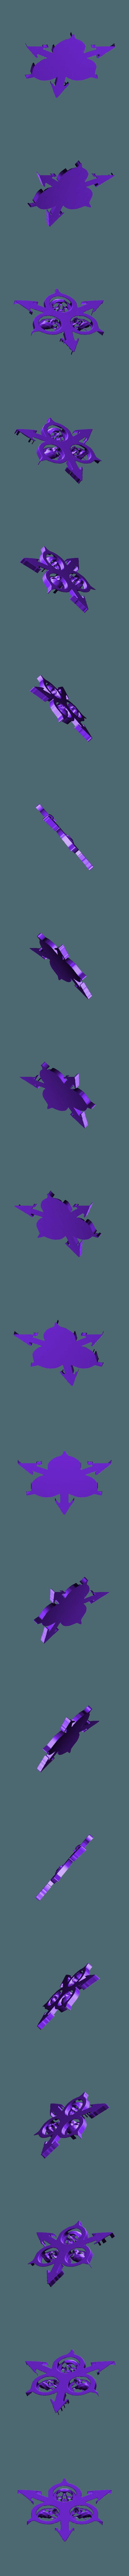 NURGLE SYMBOL.stl Download free STL file Logo Pack - Carapace • Design to 3D print, yaemhay